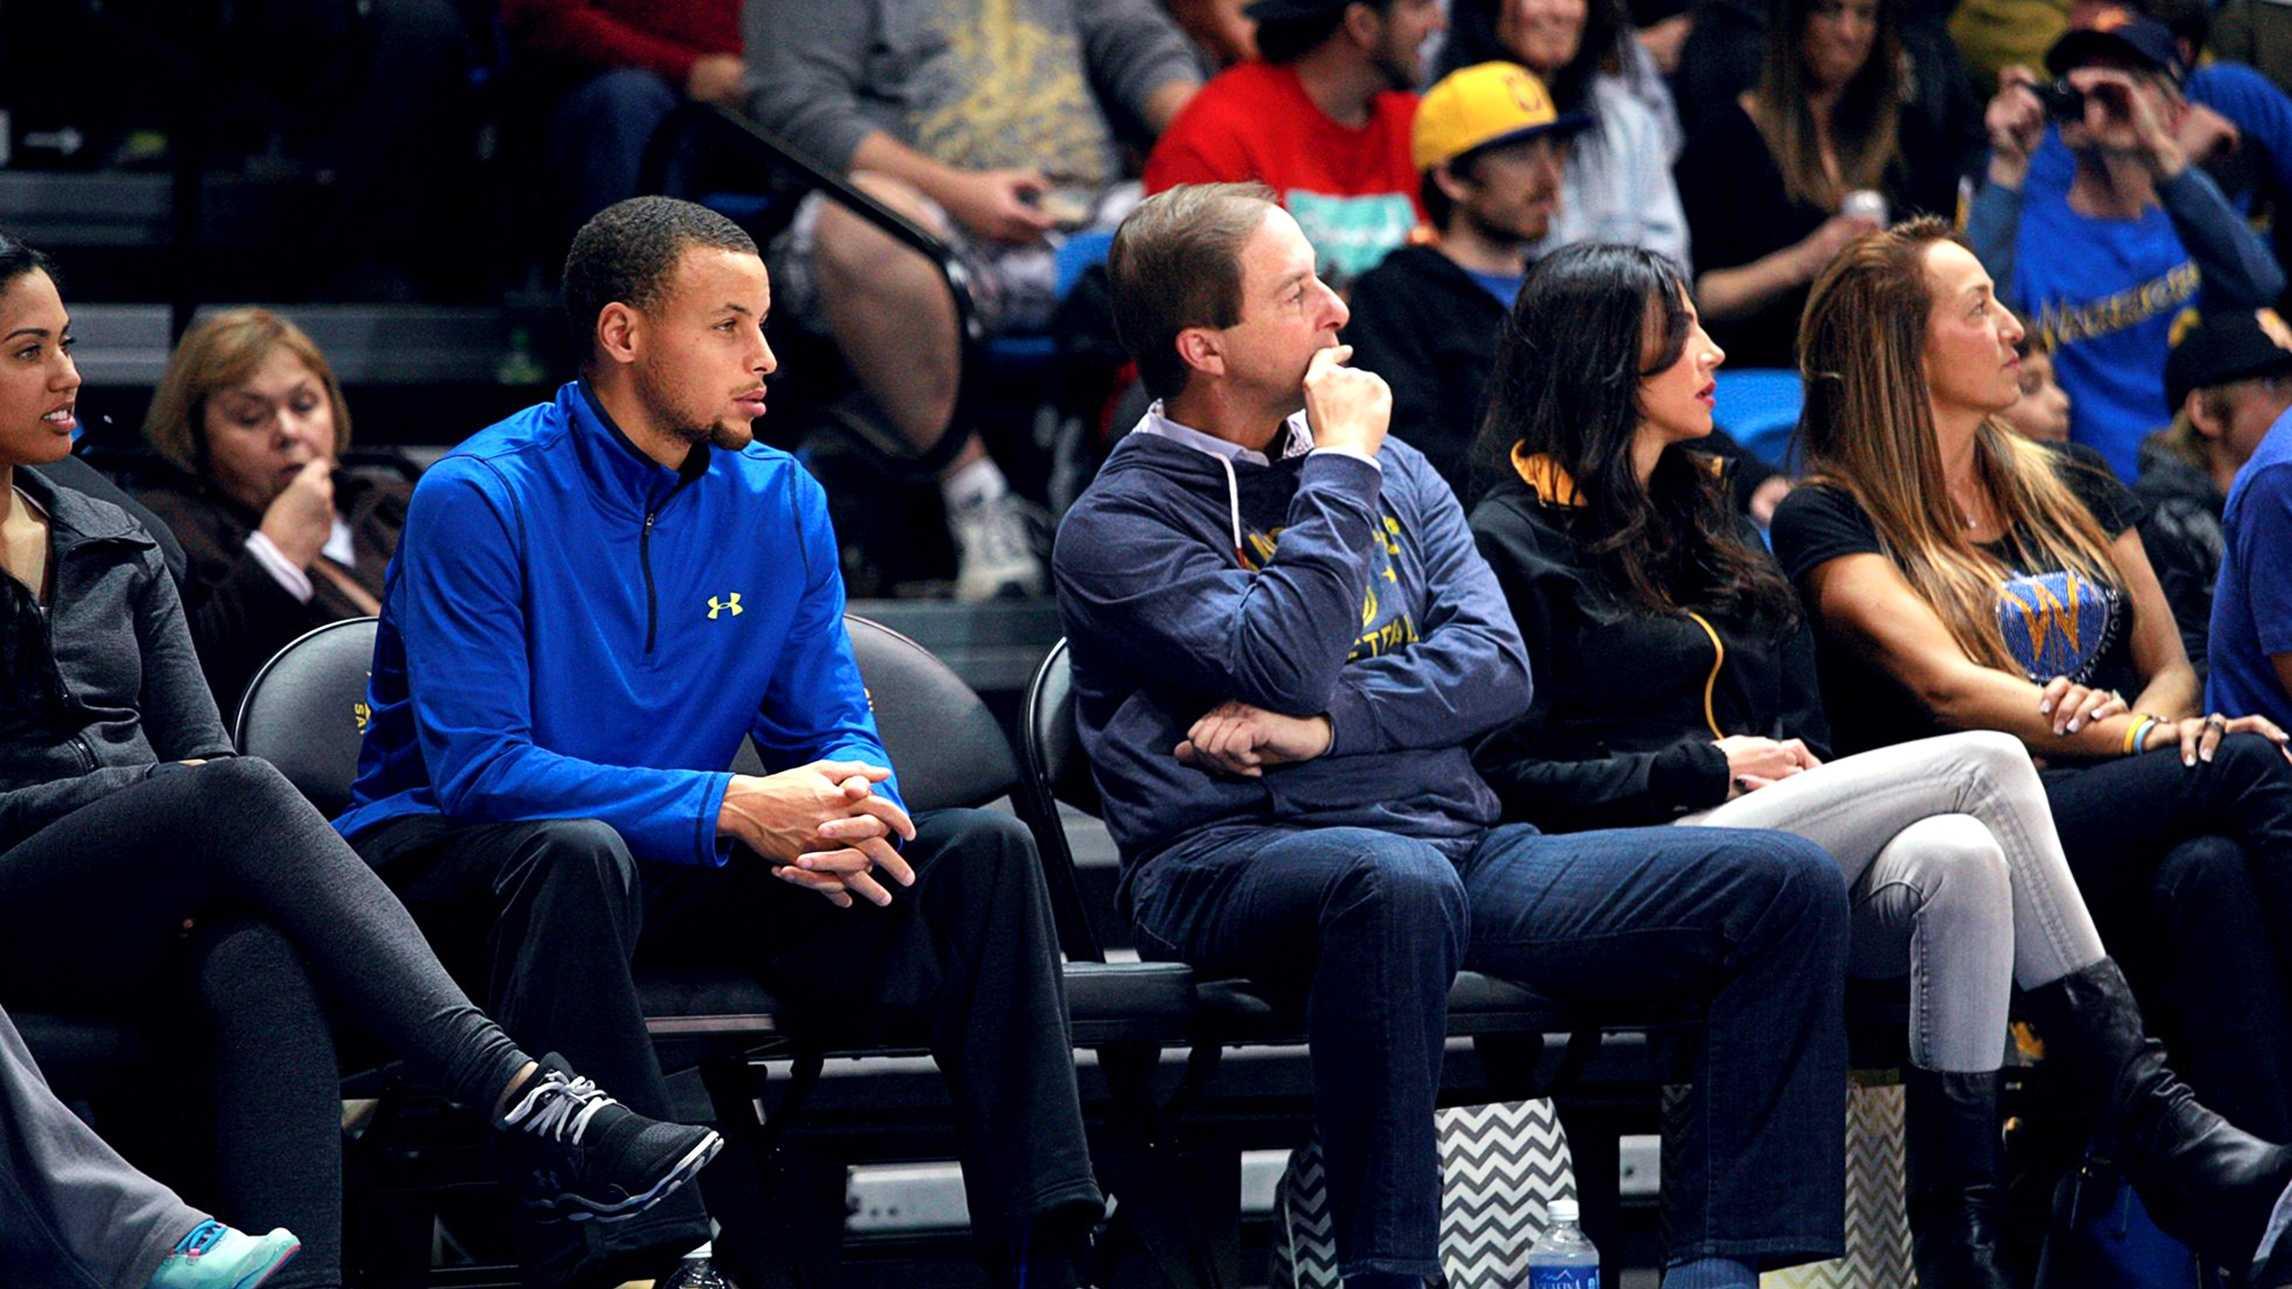 Stephen Curry cheered on his brother at the Santa Cruz Warriors' game. (Nov. 25, 2013) /Tim Cattera/ Santa Cruz Warriors